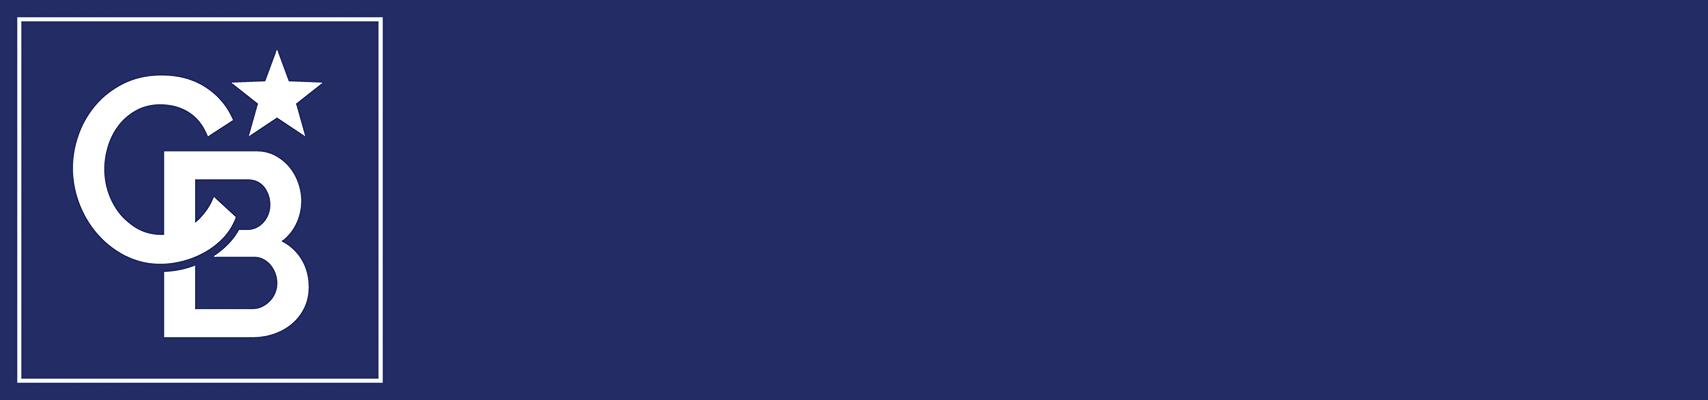 Jaime Stiansen - Coldwell Banker Sky Ridge Realty Logo